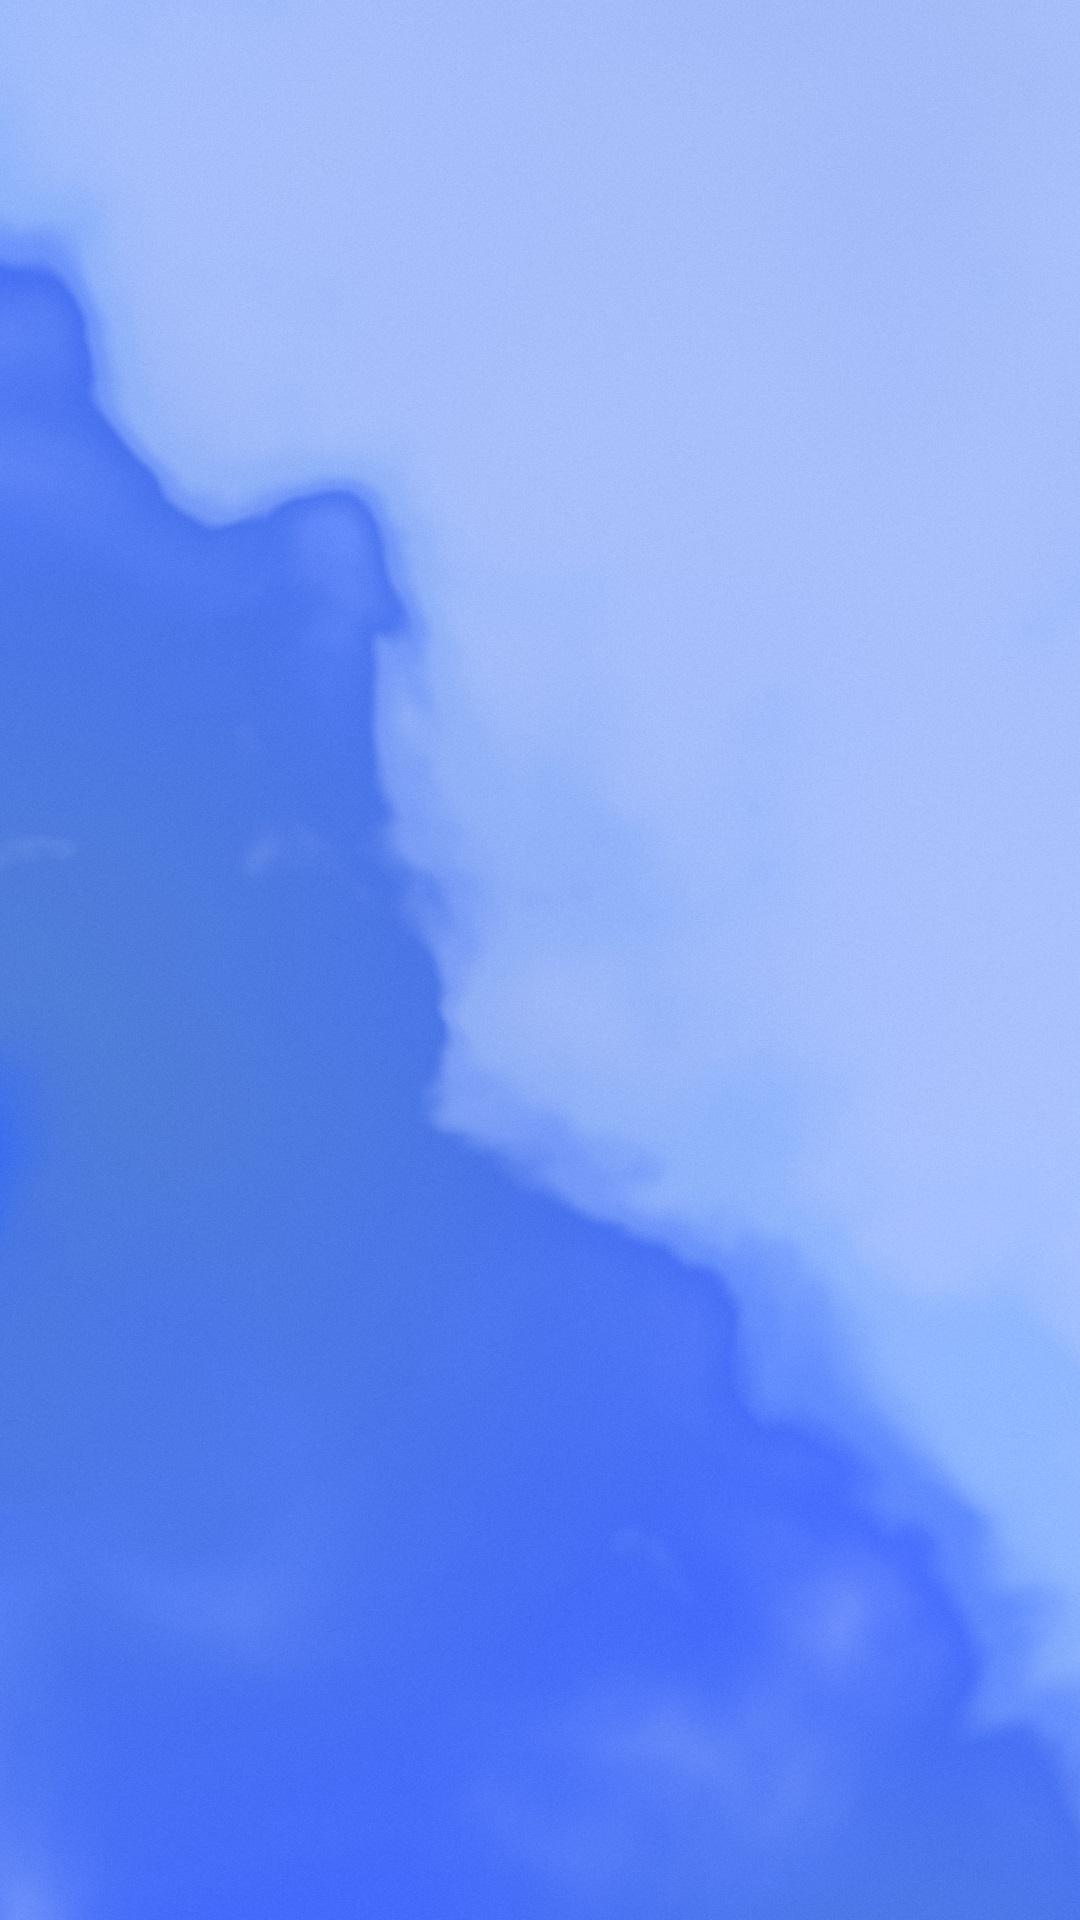 Google Pixel Water Wallpapers - Top Free Google Pixel Water